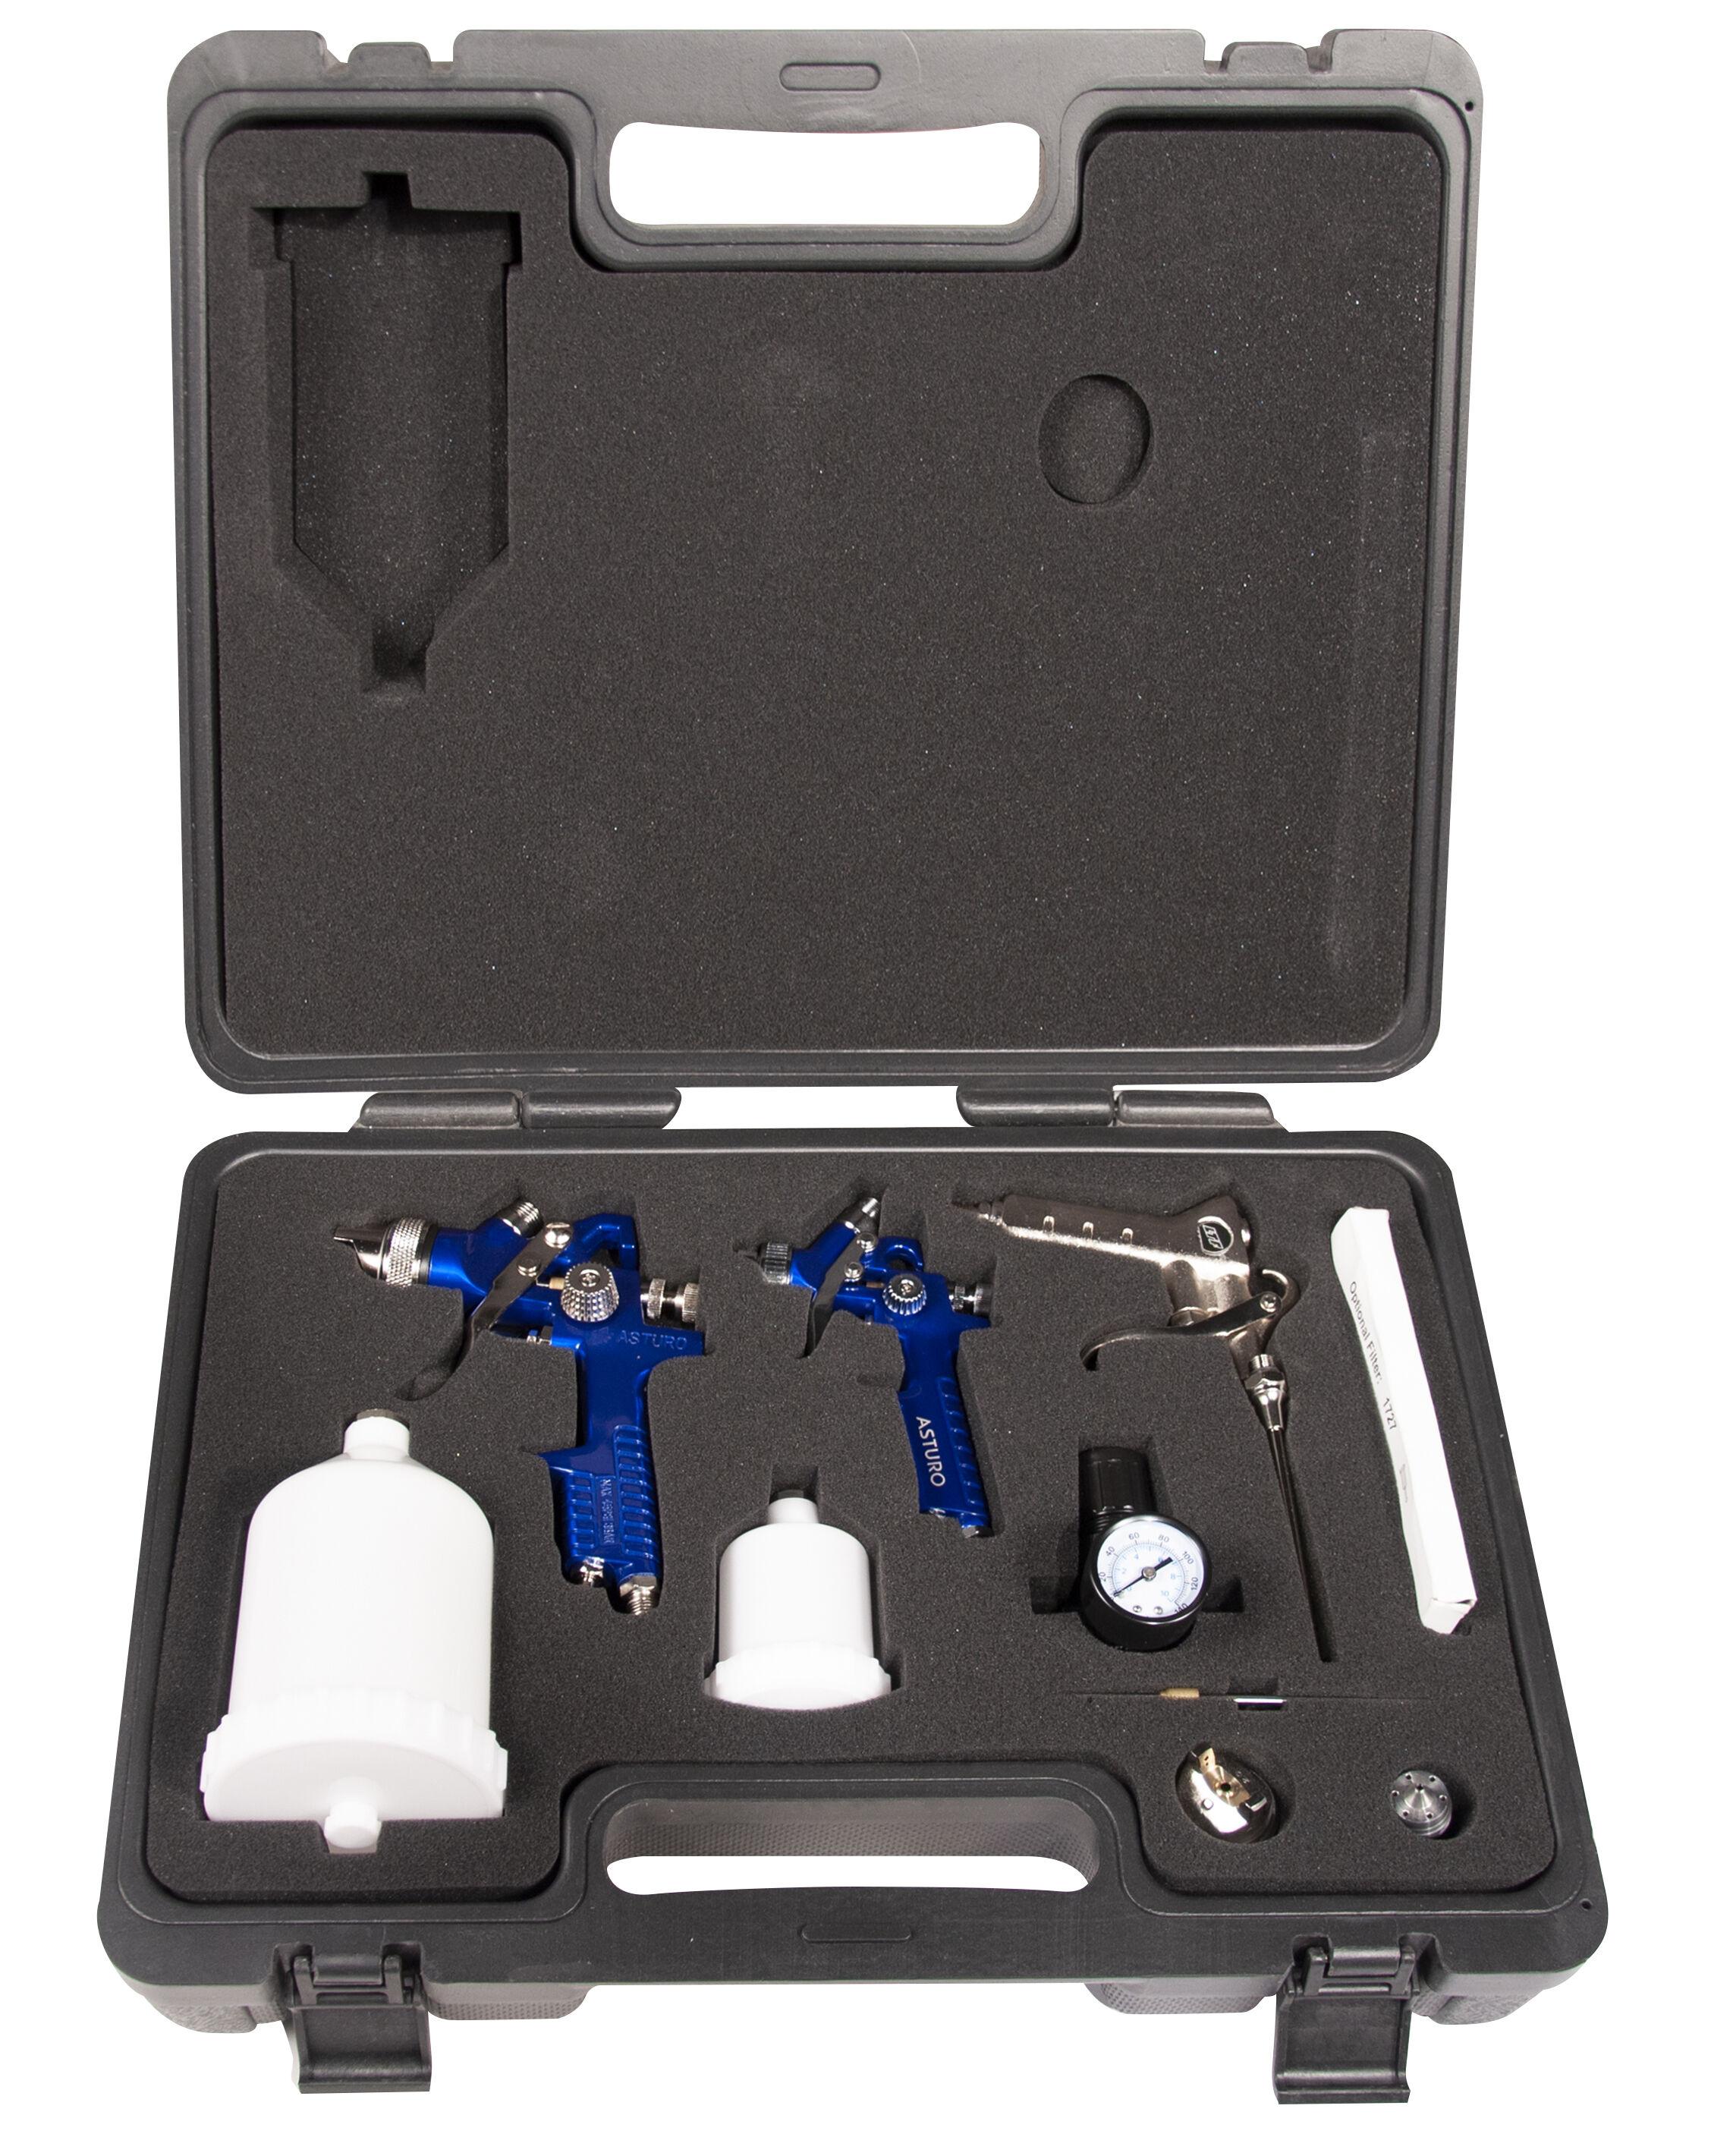 asturo kit aerografo manuale superiore a bassa pressione asturo h827 h2000 / kit 0090517k